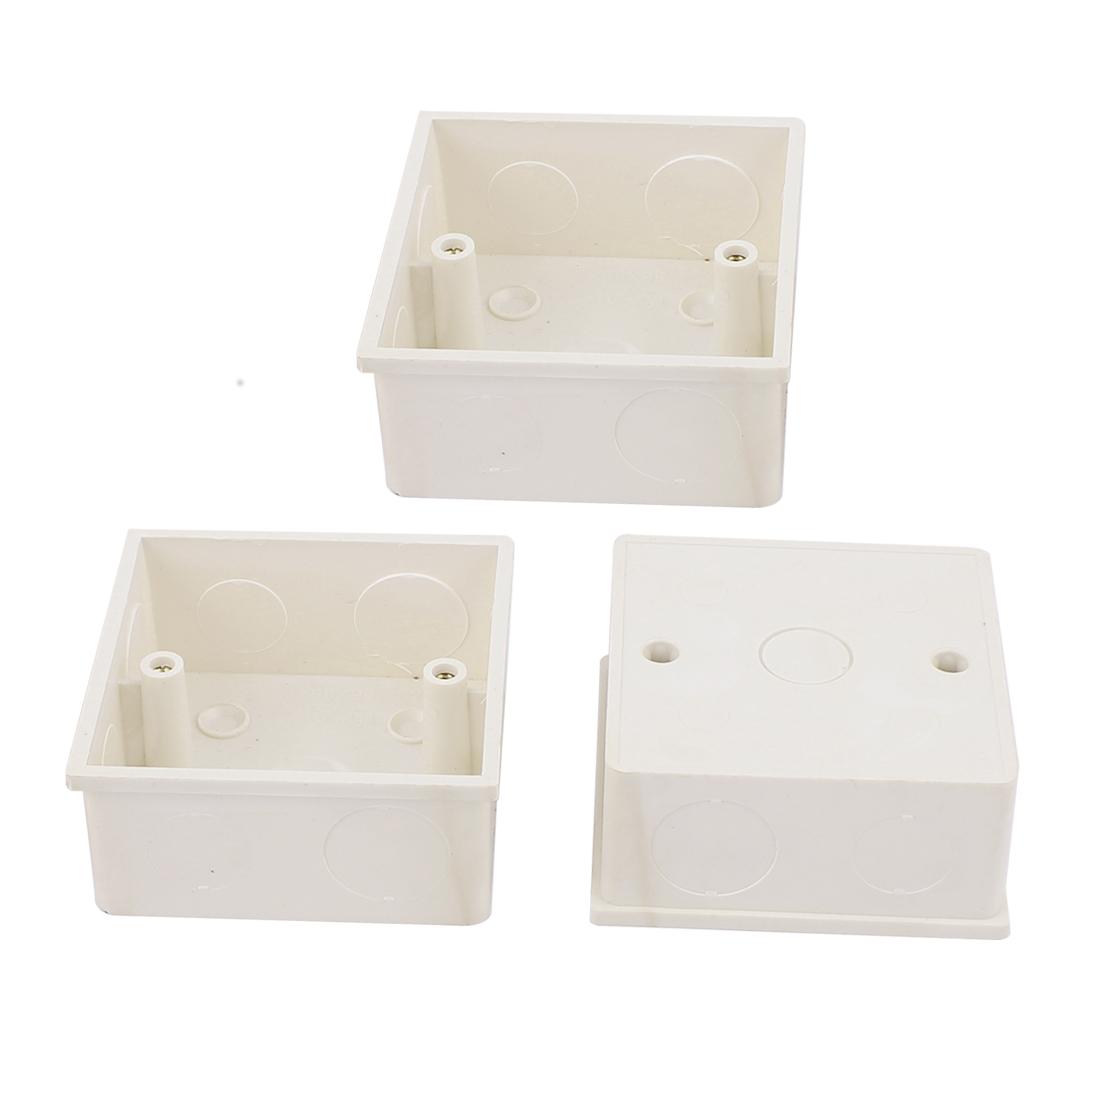 3pcs 86mm x 86mm x 39mm White PVC Square Single Gang Mount Back Box for Wall Socket